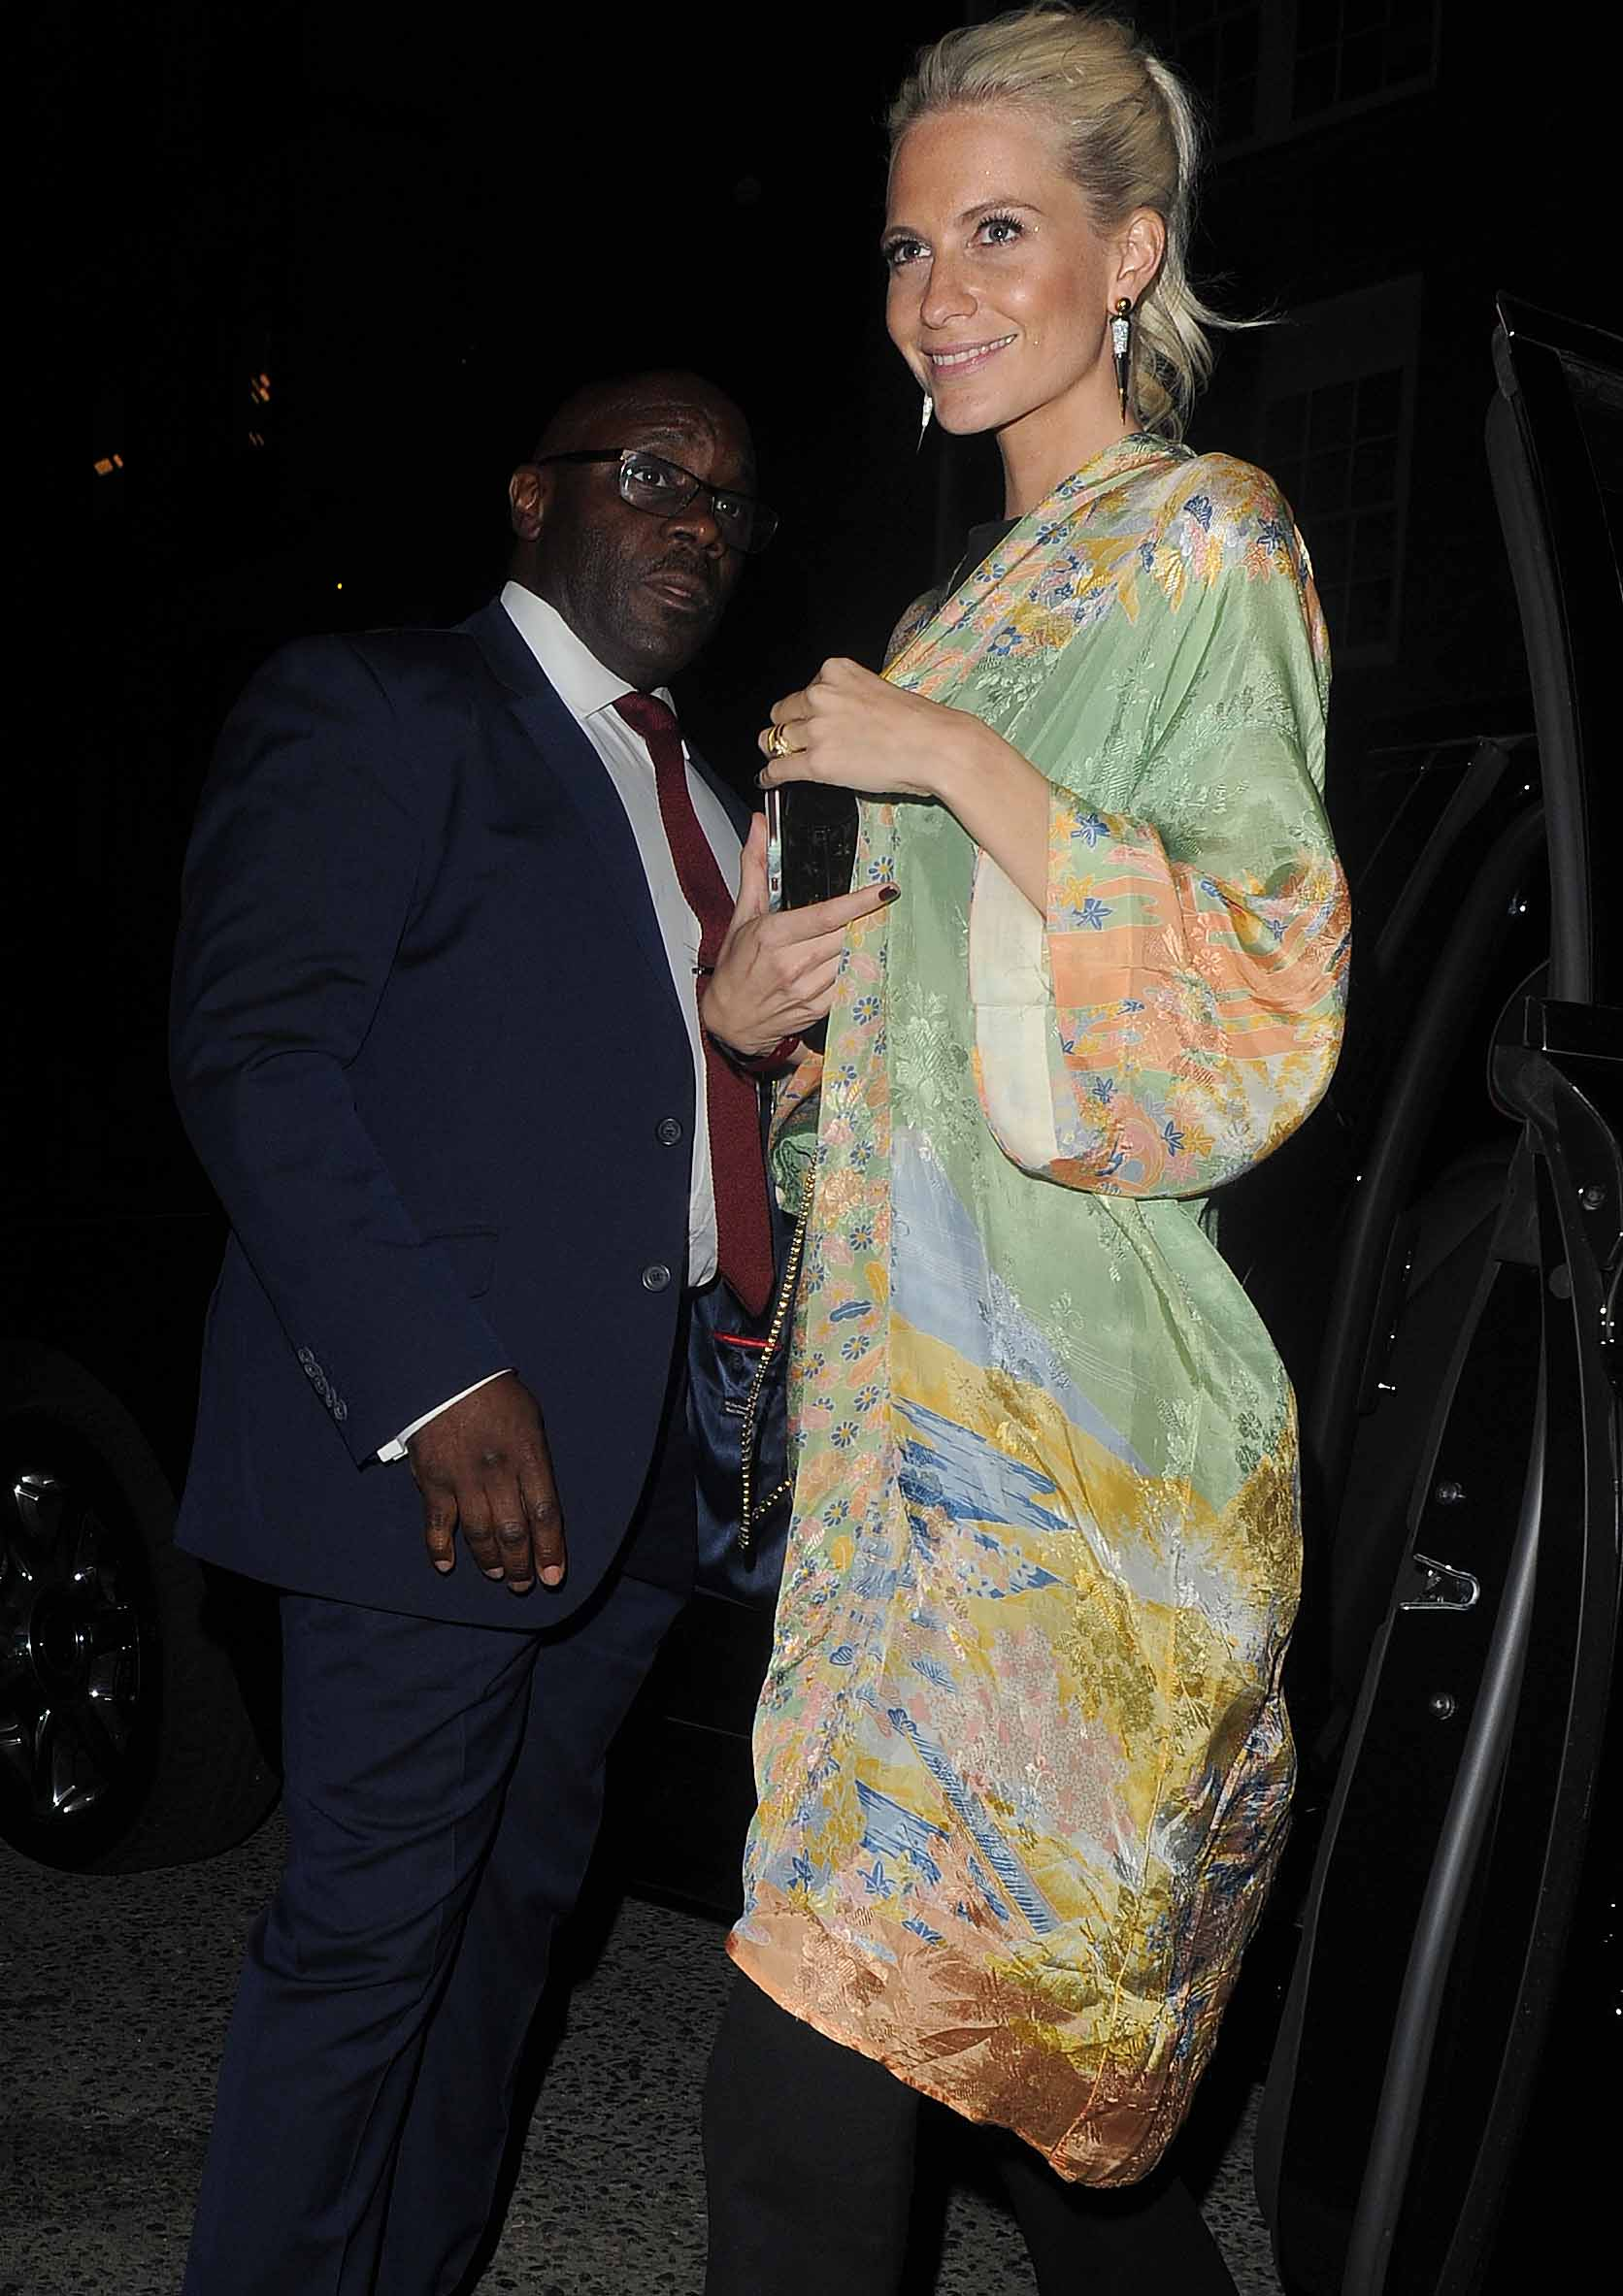 Get The Look: Poppy Delevingne's Pretty In Pastels Kimono Duster